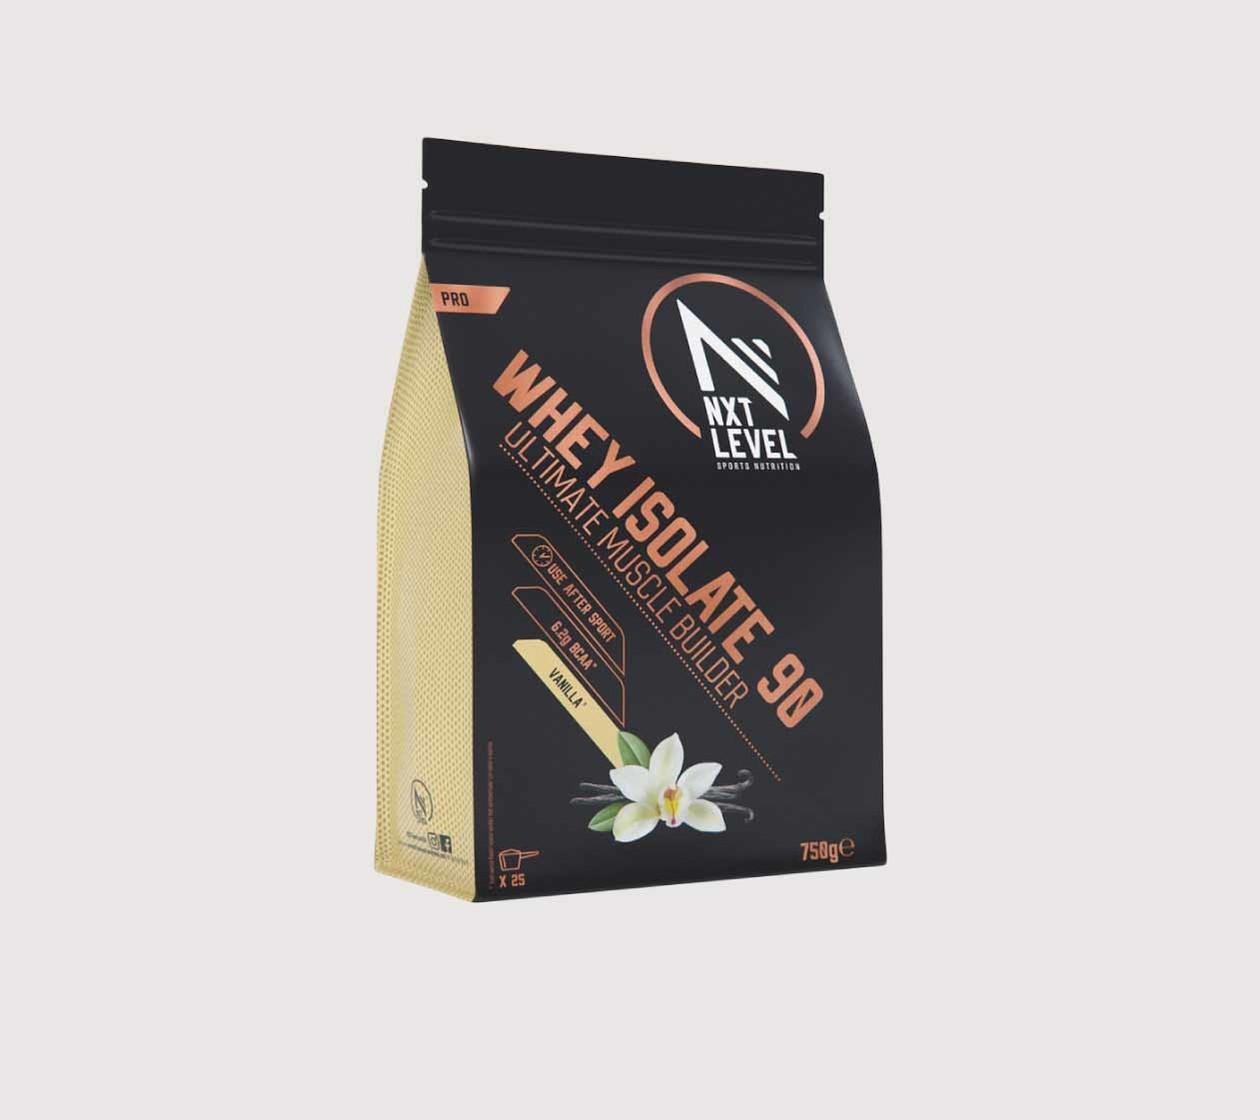 Whey Isolate 90 (750g) - Elija entre 4 sabores